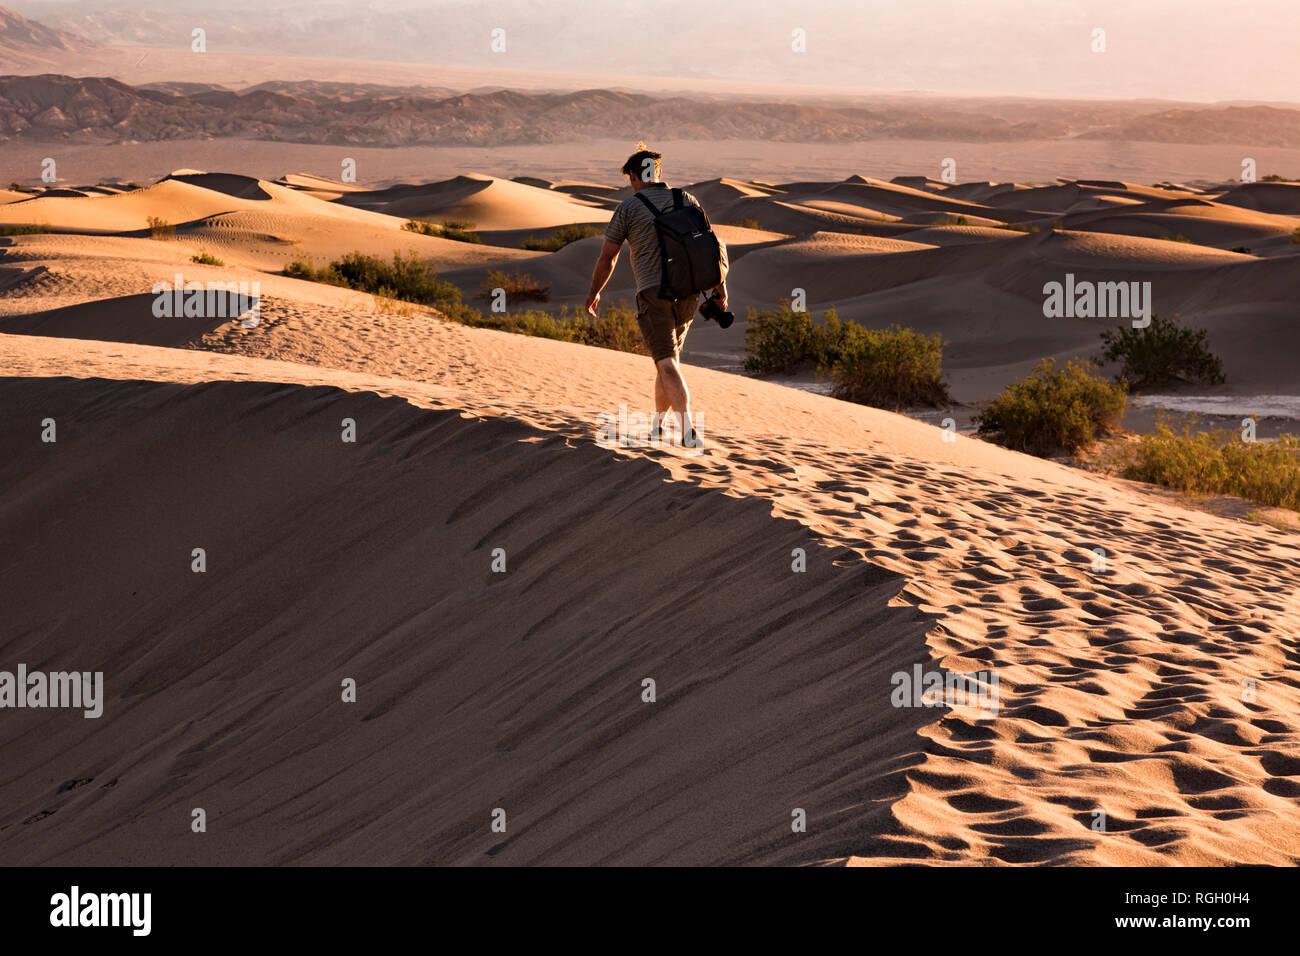 USA, Californien, Death Valley, Death Valley National Park, Mesquite Flat Sand Dunes, man walking on dune - Stock Image